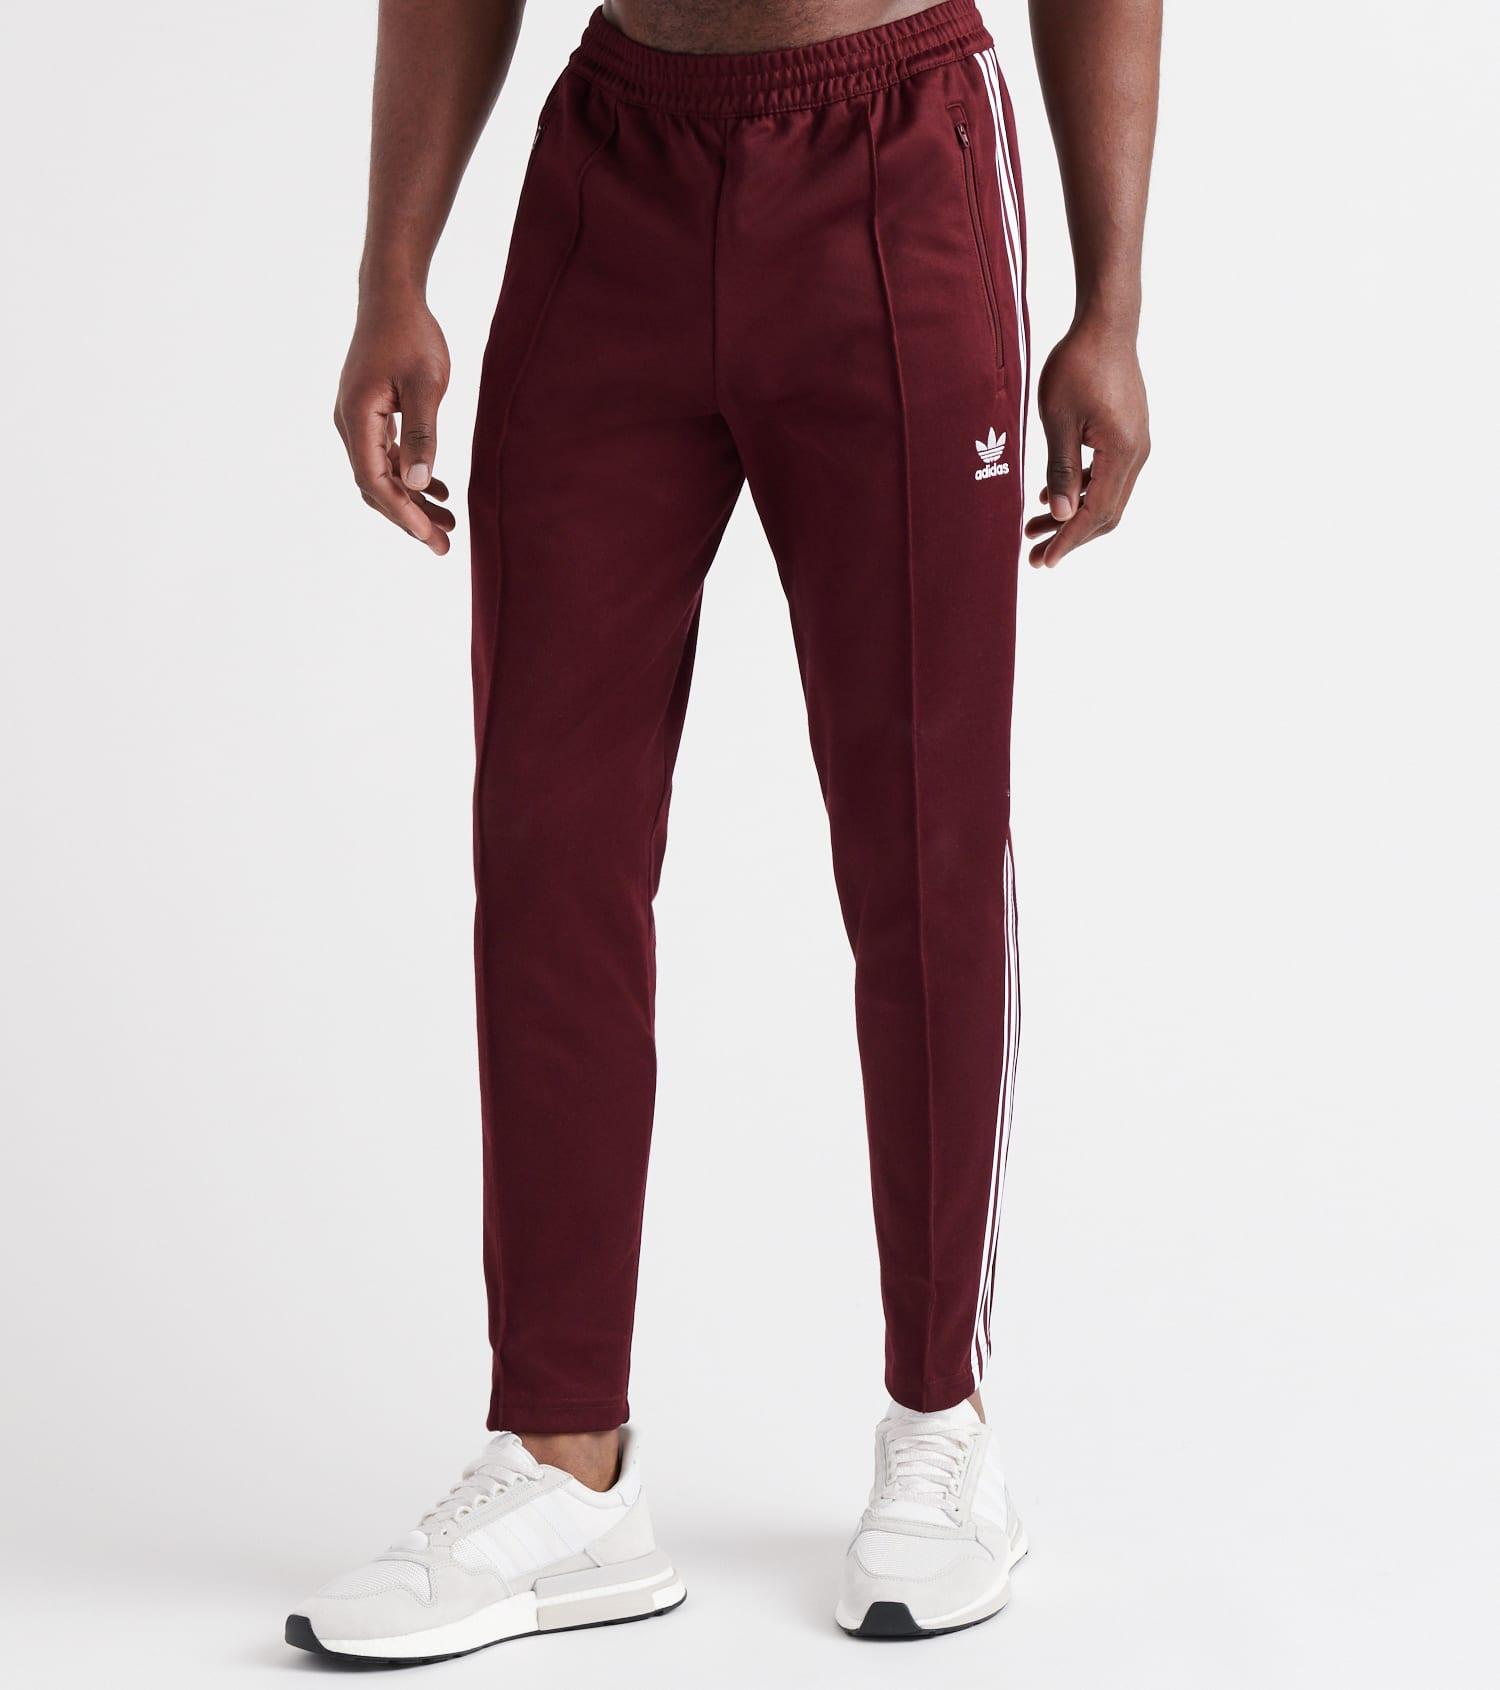 Details about Adidas Men Originals Beckenbauer Track Pants Maroon Training Running Pant DH5825